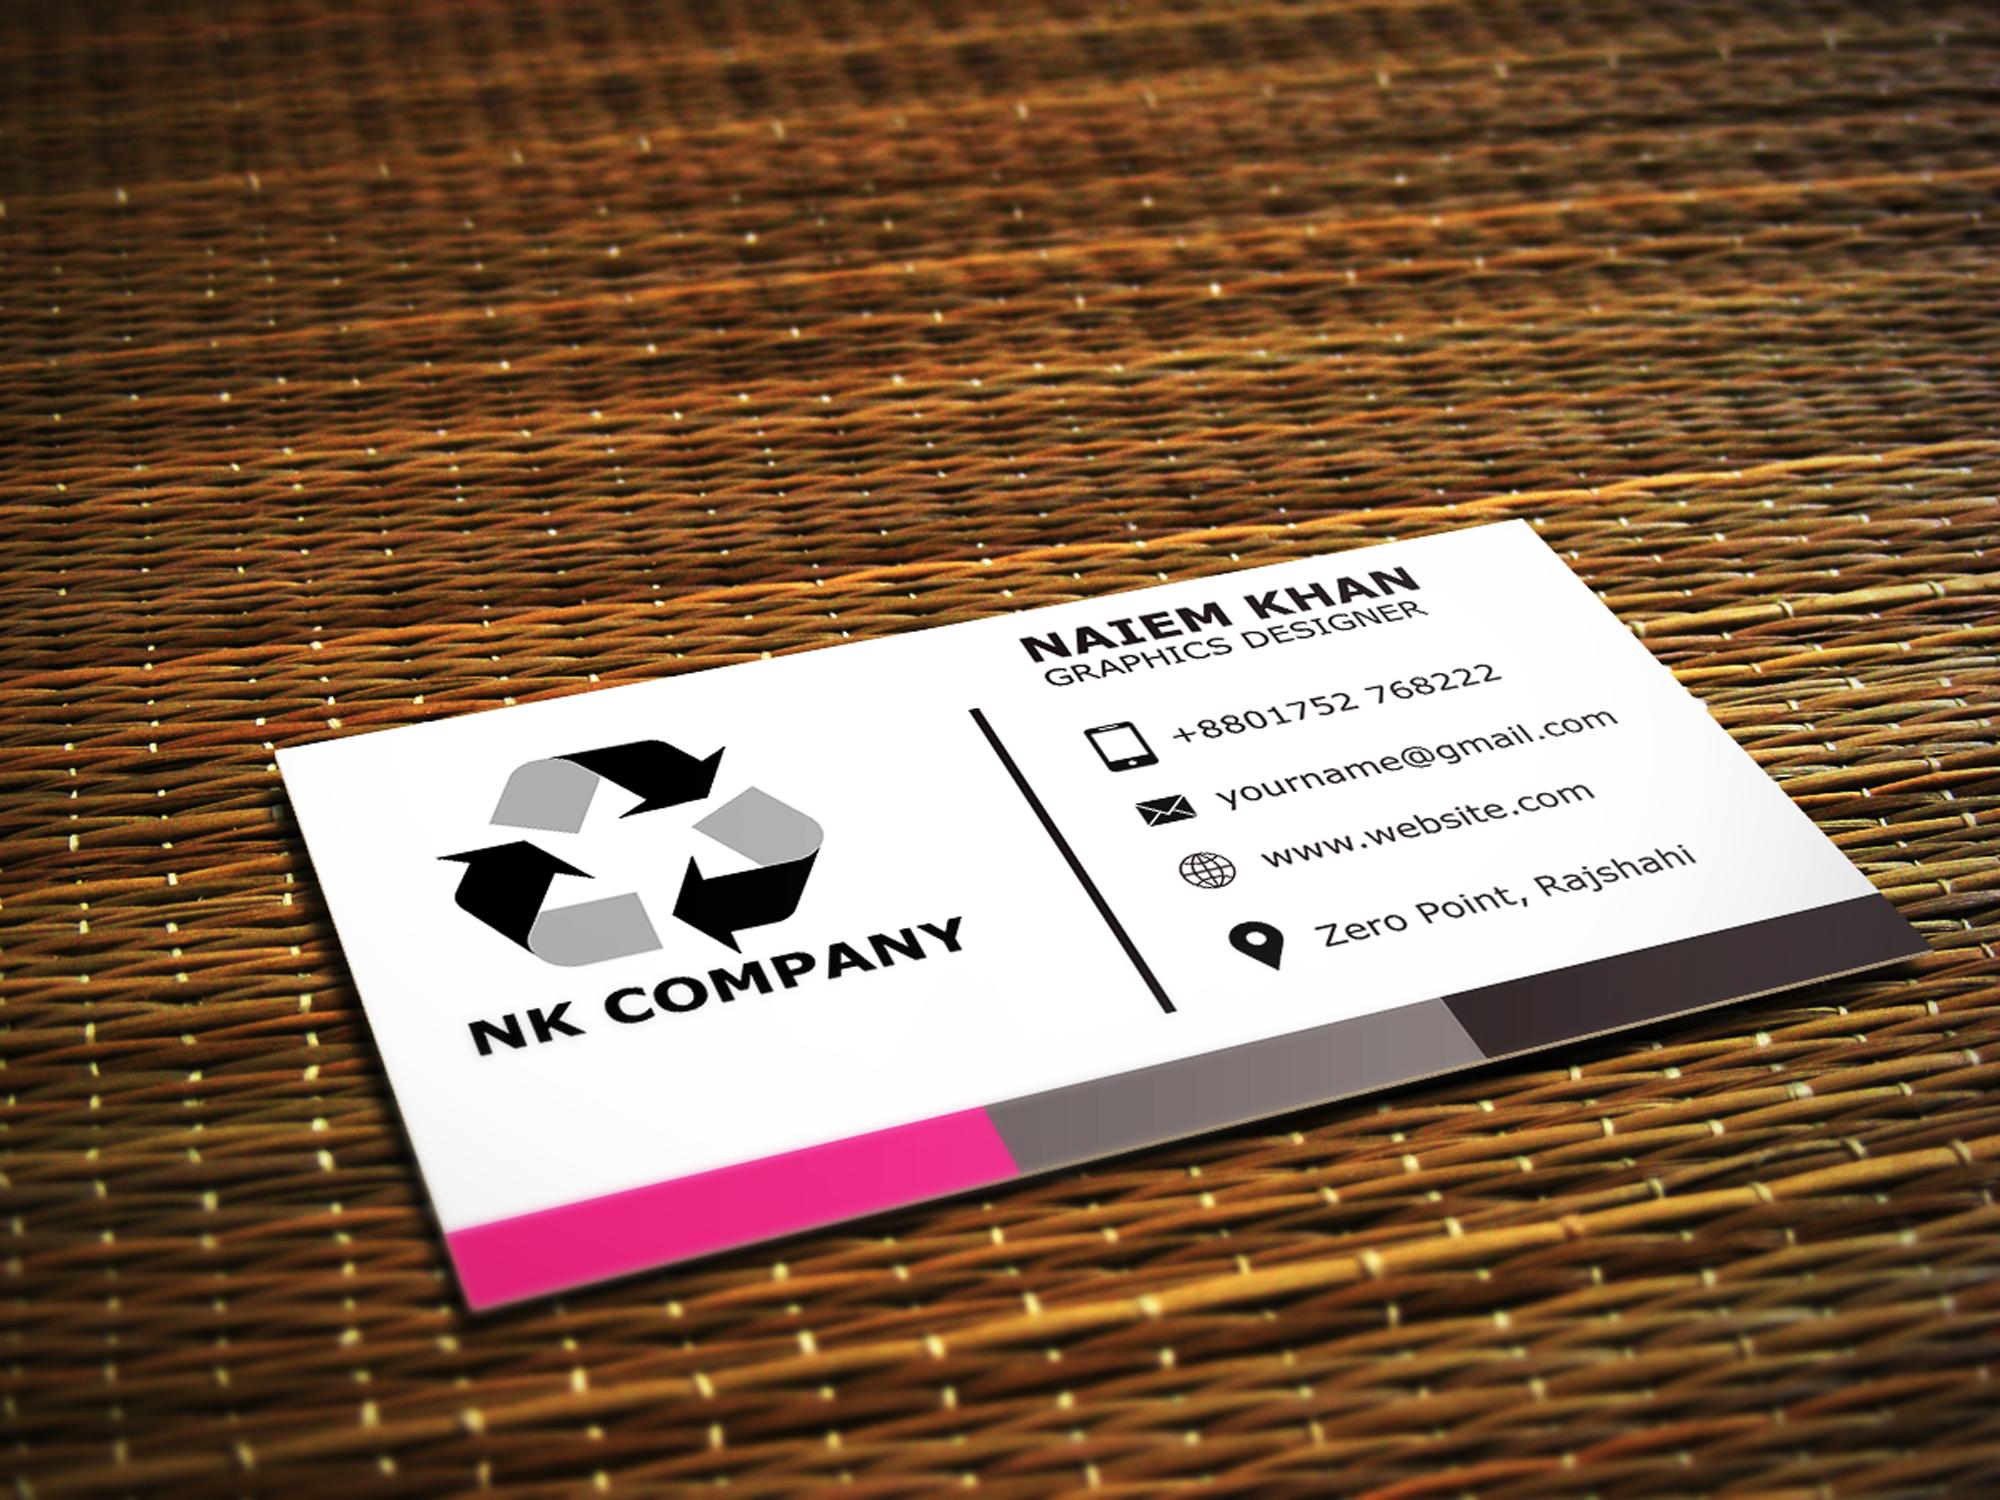 I will creative, unique and professional business card design